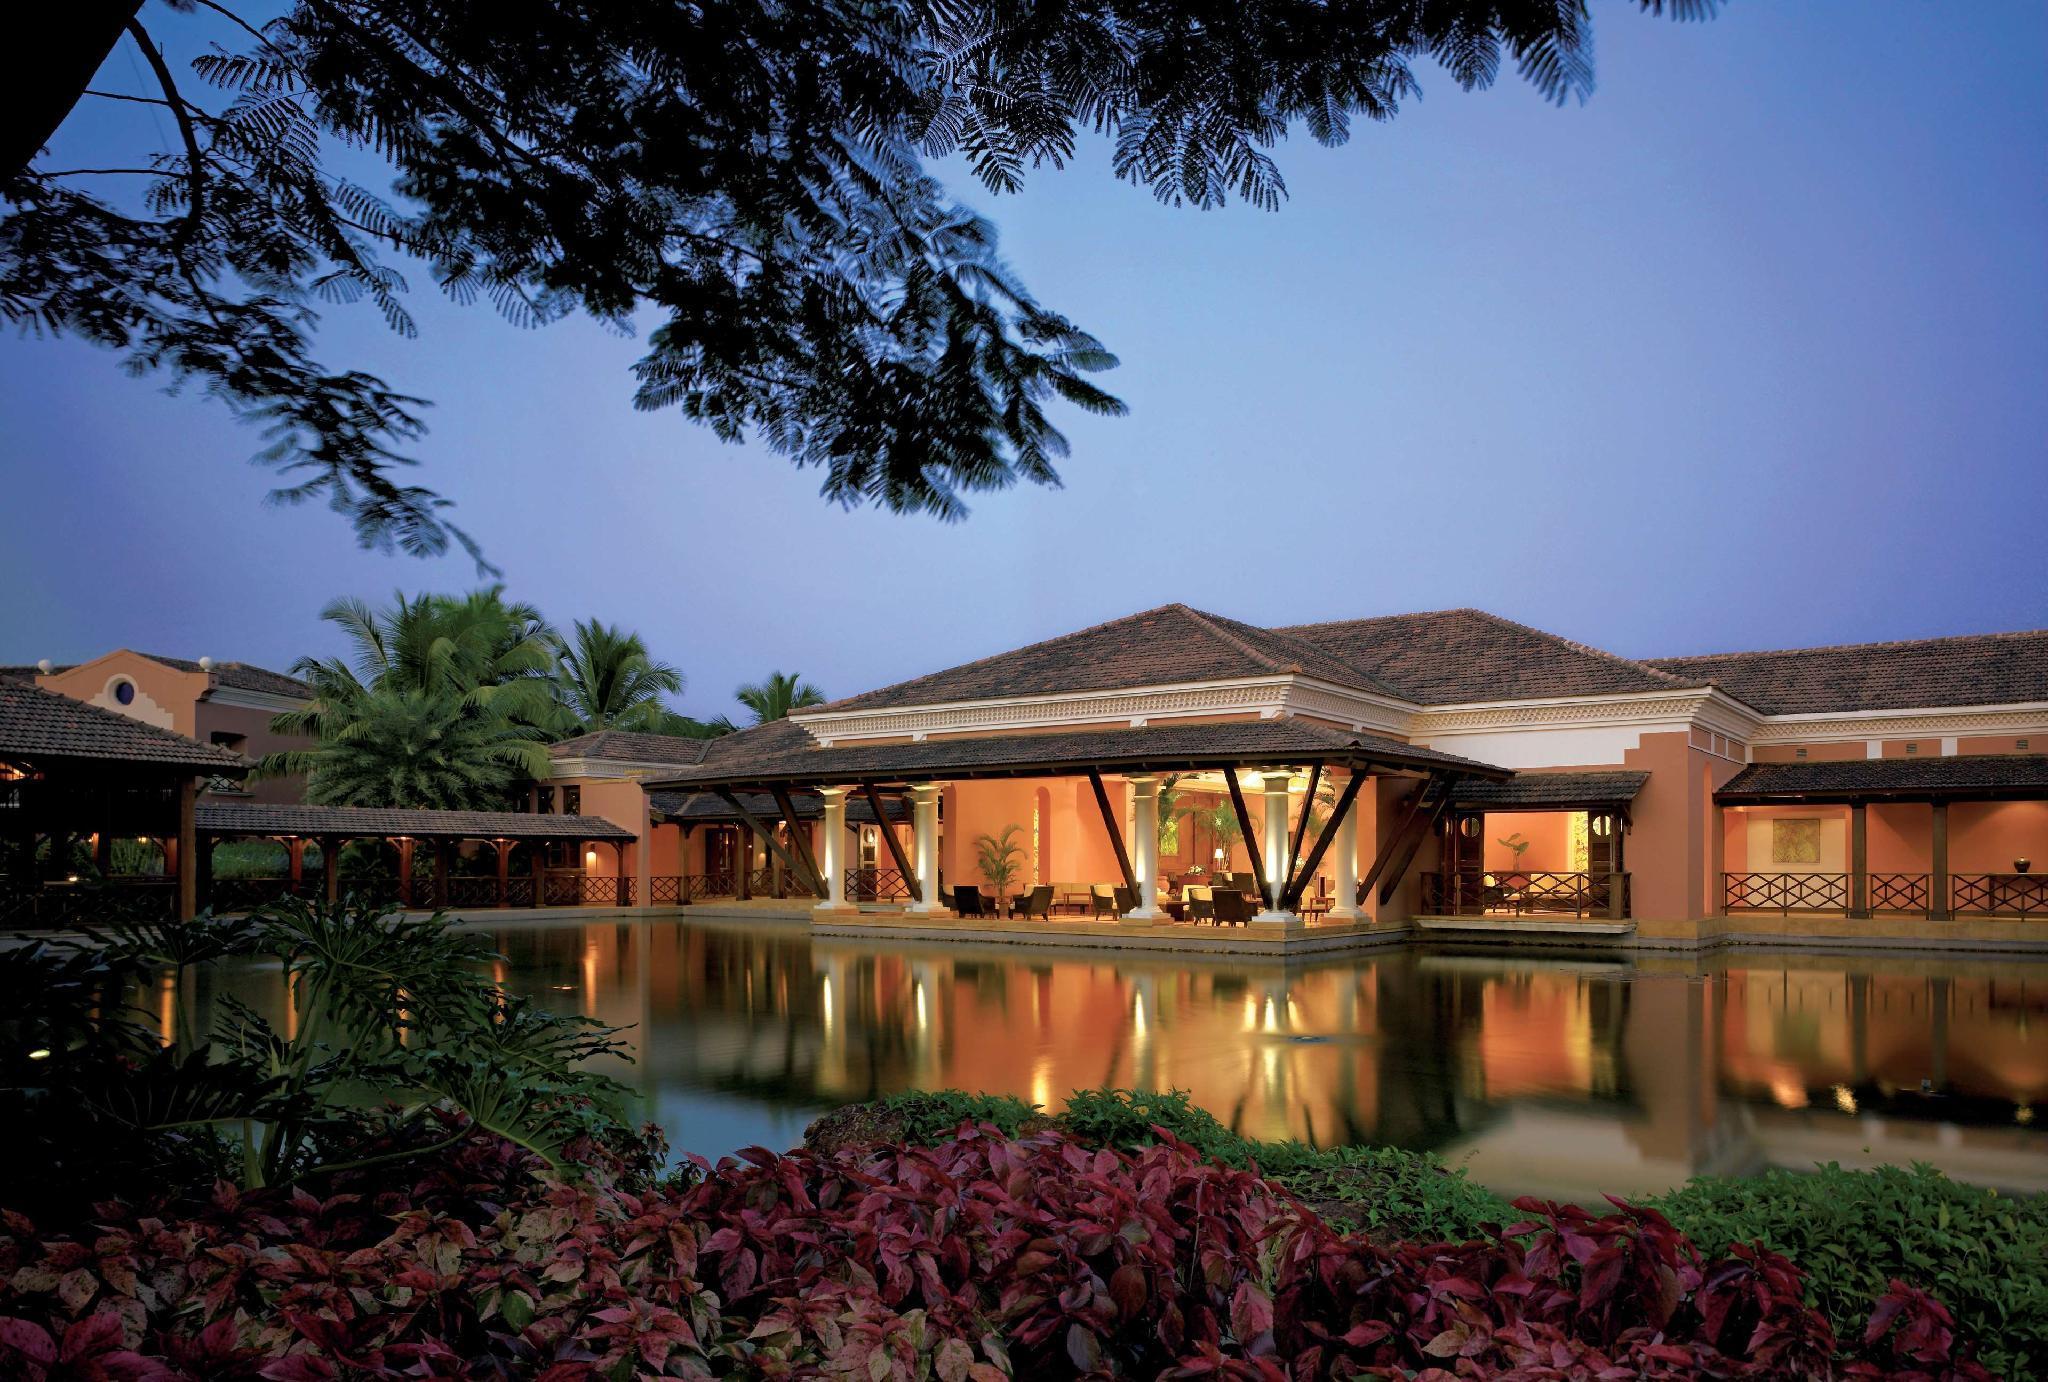 Hotels in Goa, India 5 Star Luxury Hotels in Goa Holi Party. - Hyatt Park hyatt goa pictures